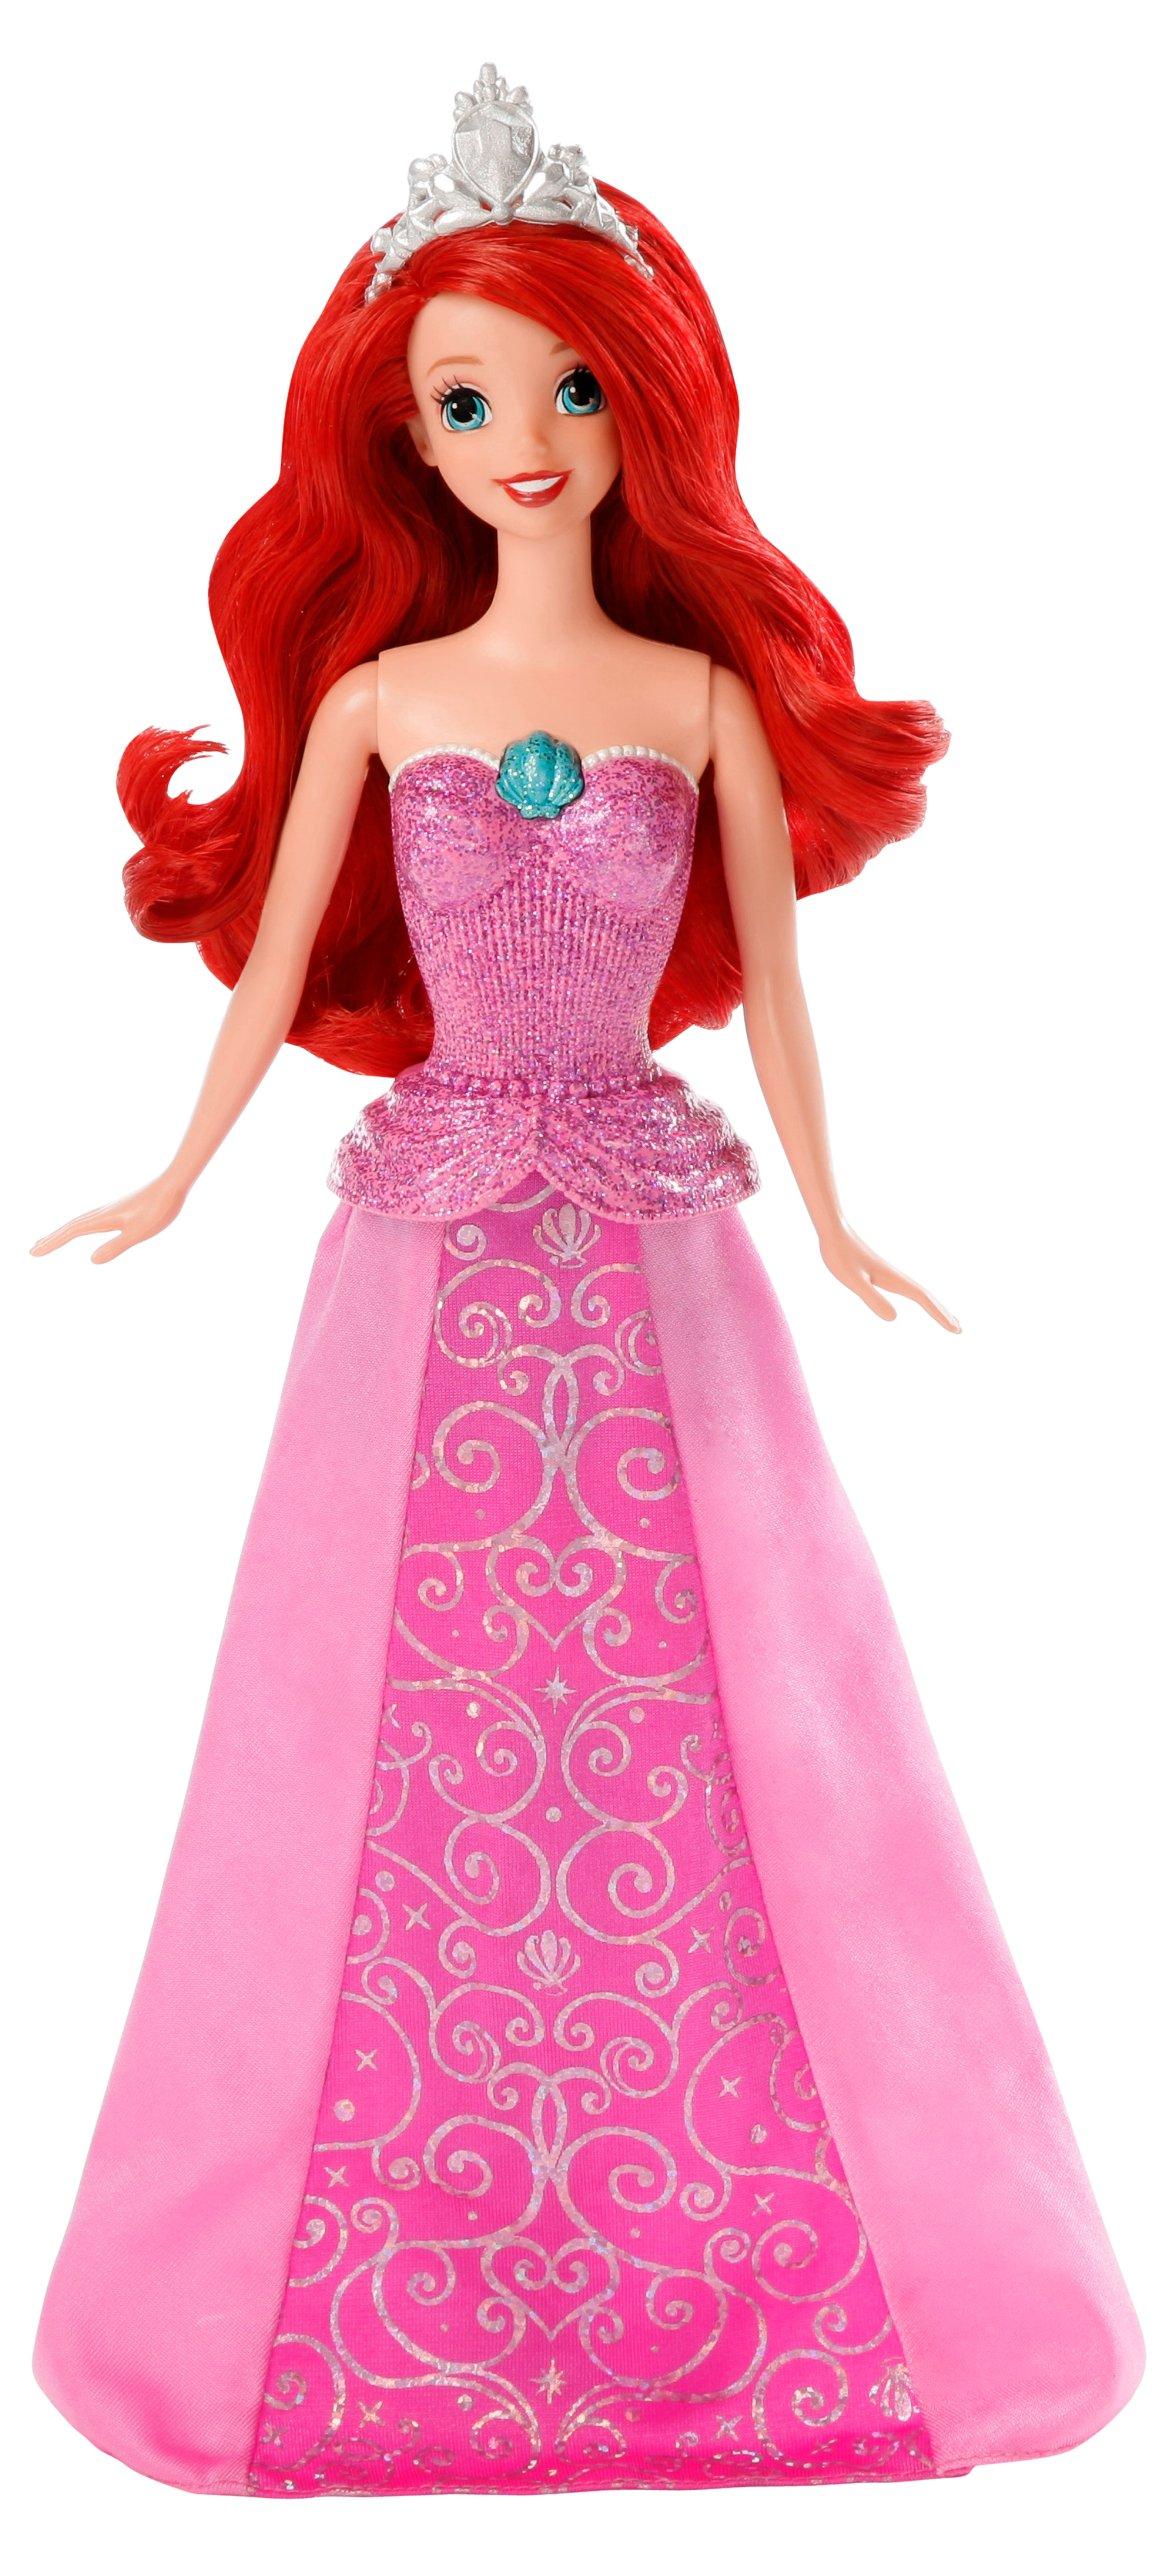 Disney Princess Mermaid to Princess Singing Ariel Doll ...